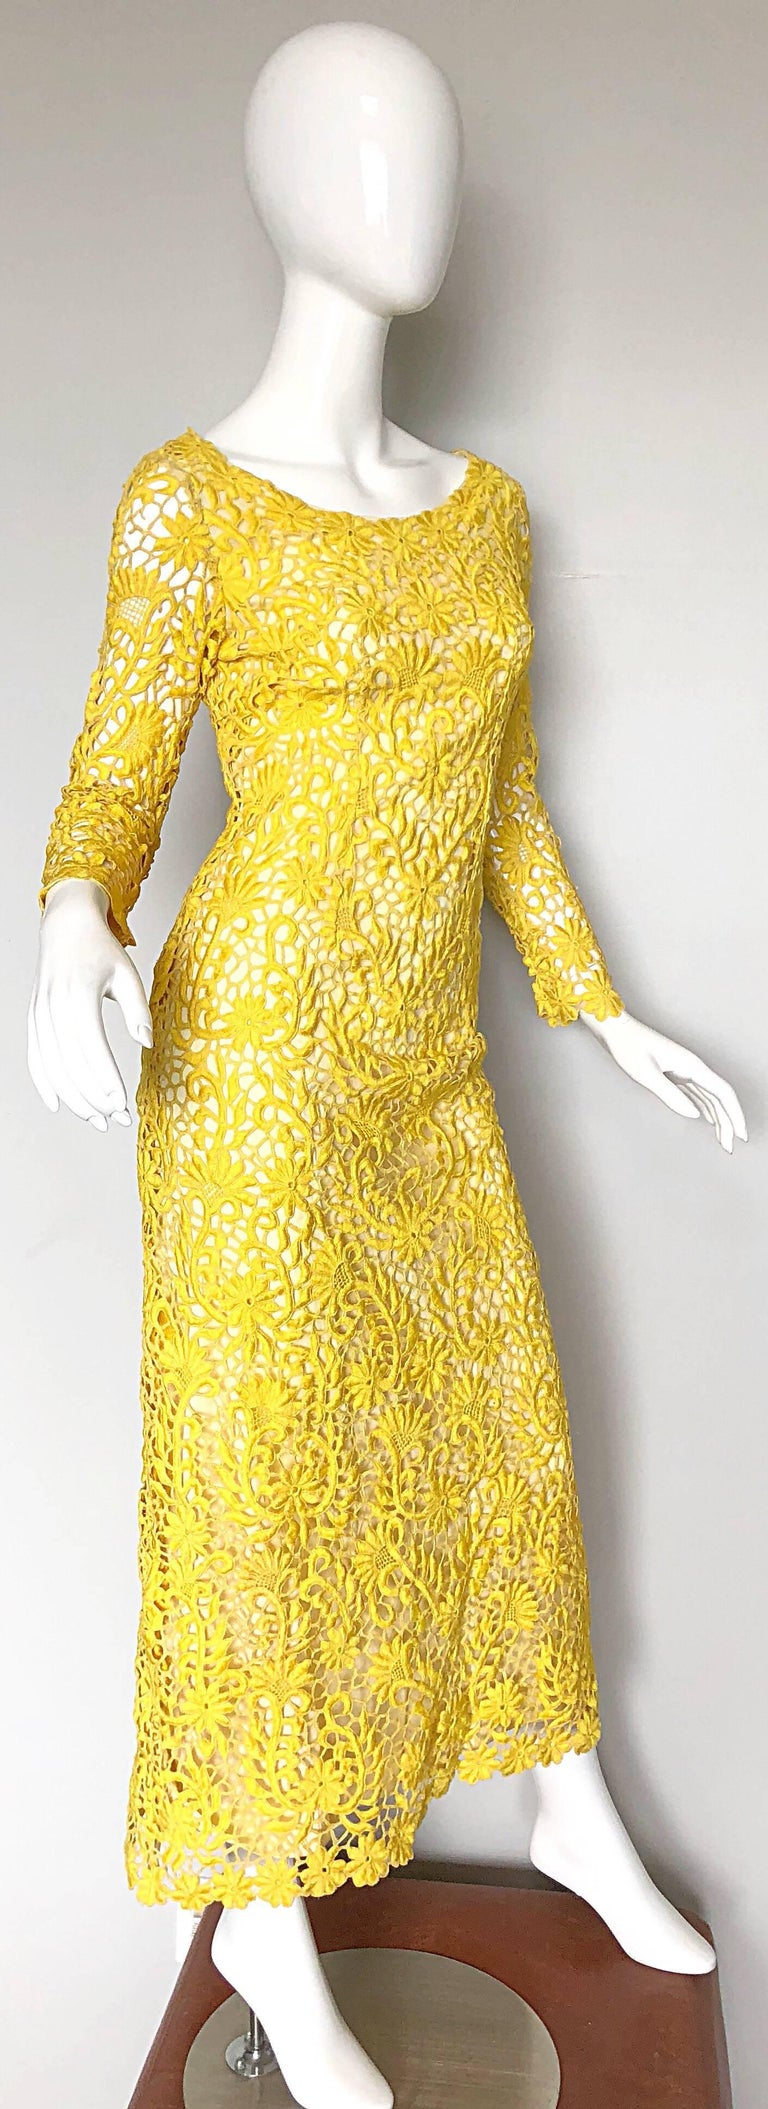 f97c6df2771 Joe Salazar Rare 1960s Canary Yellow Hand Crochet Vintage 60s Maxi Dress  Gown For Sale 2